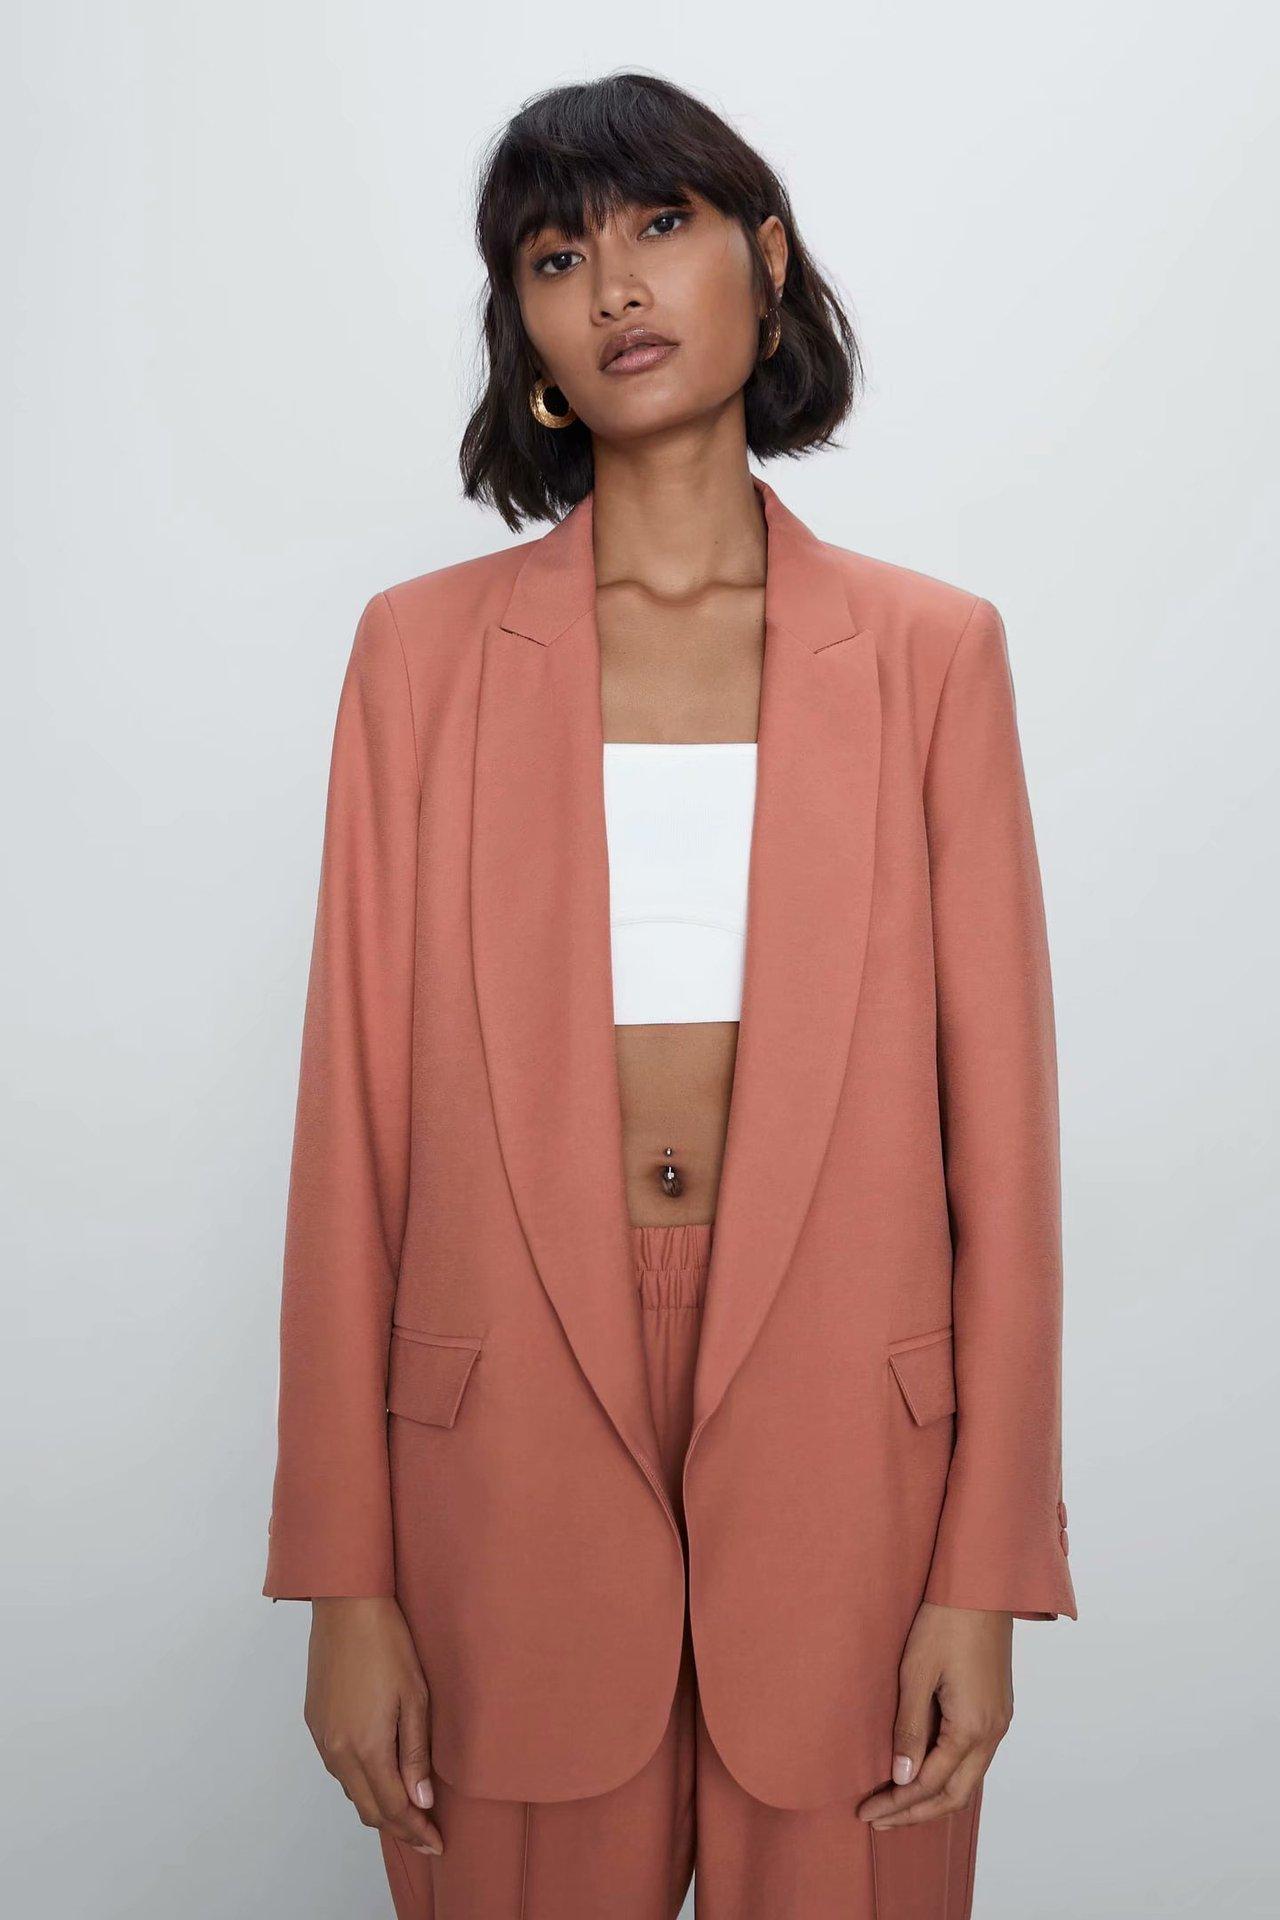 2020 New Spring Summer European Silk Satin Zaraing Women Suit Jacket Coat Sheining Vadiming Female Small Suit Bgb2193